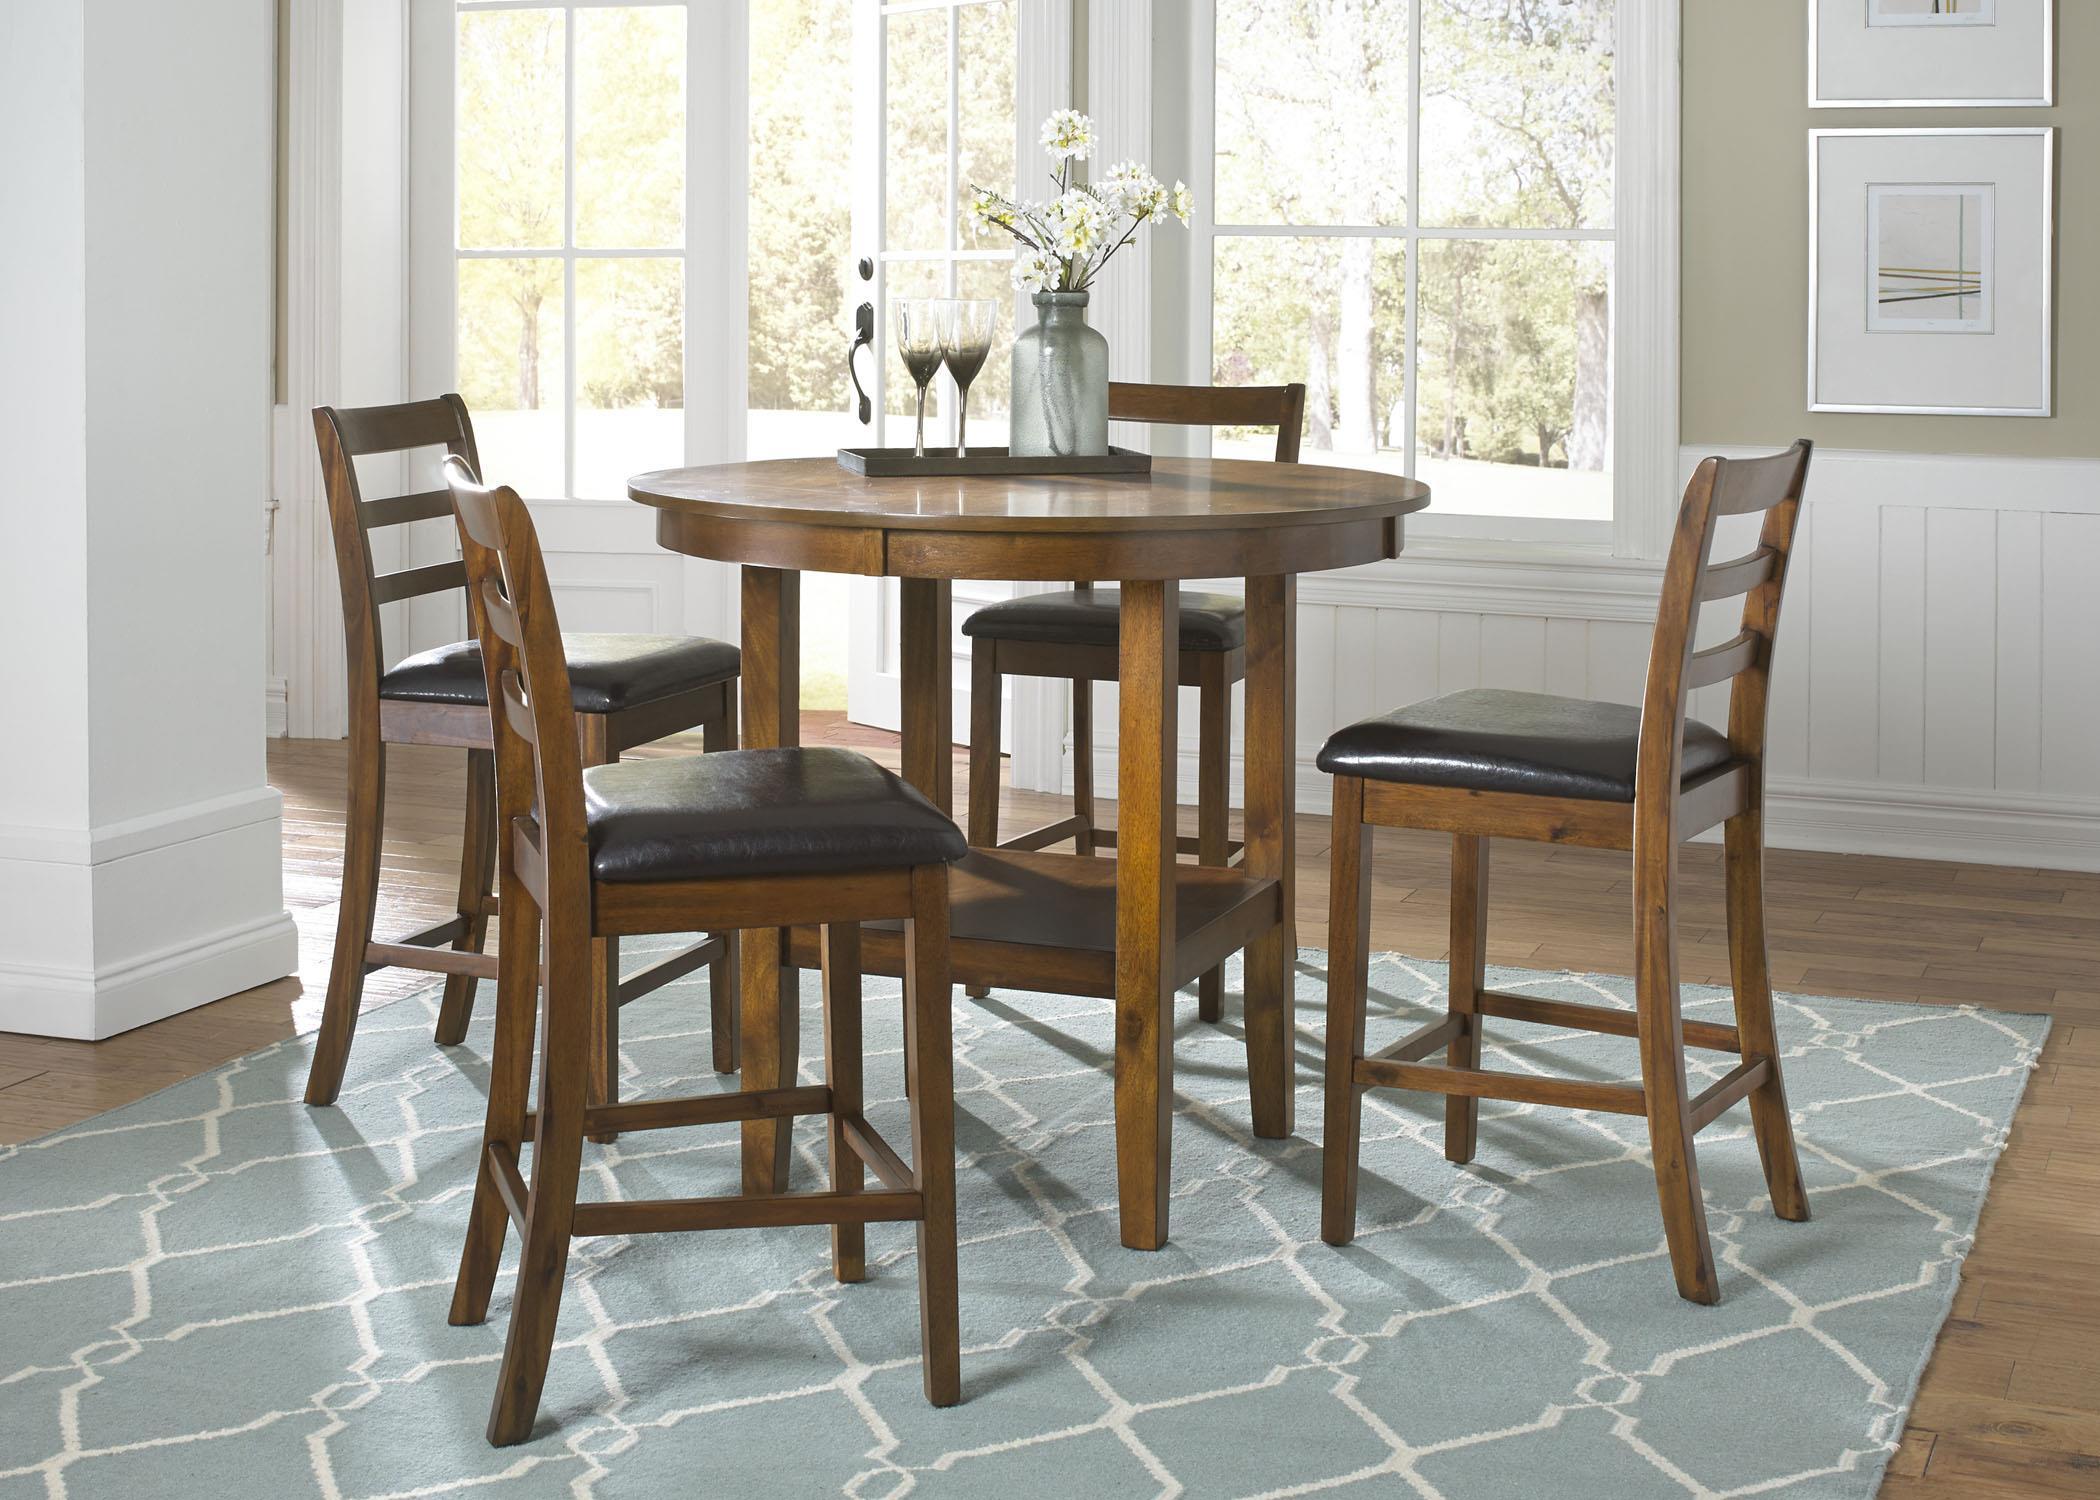 Liberty Furniture Tucson Dining II 5 Piece Pub Table Set